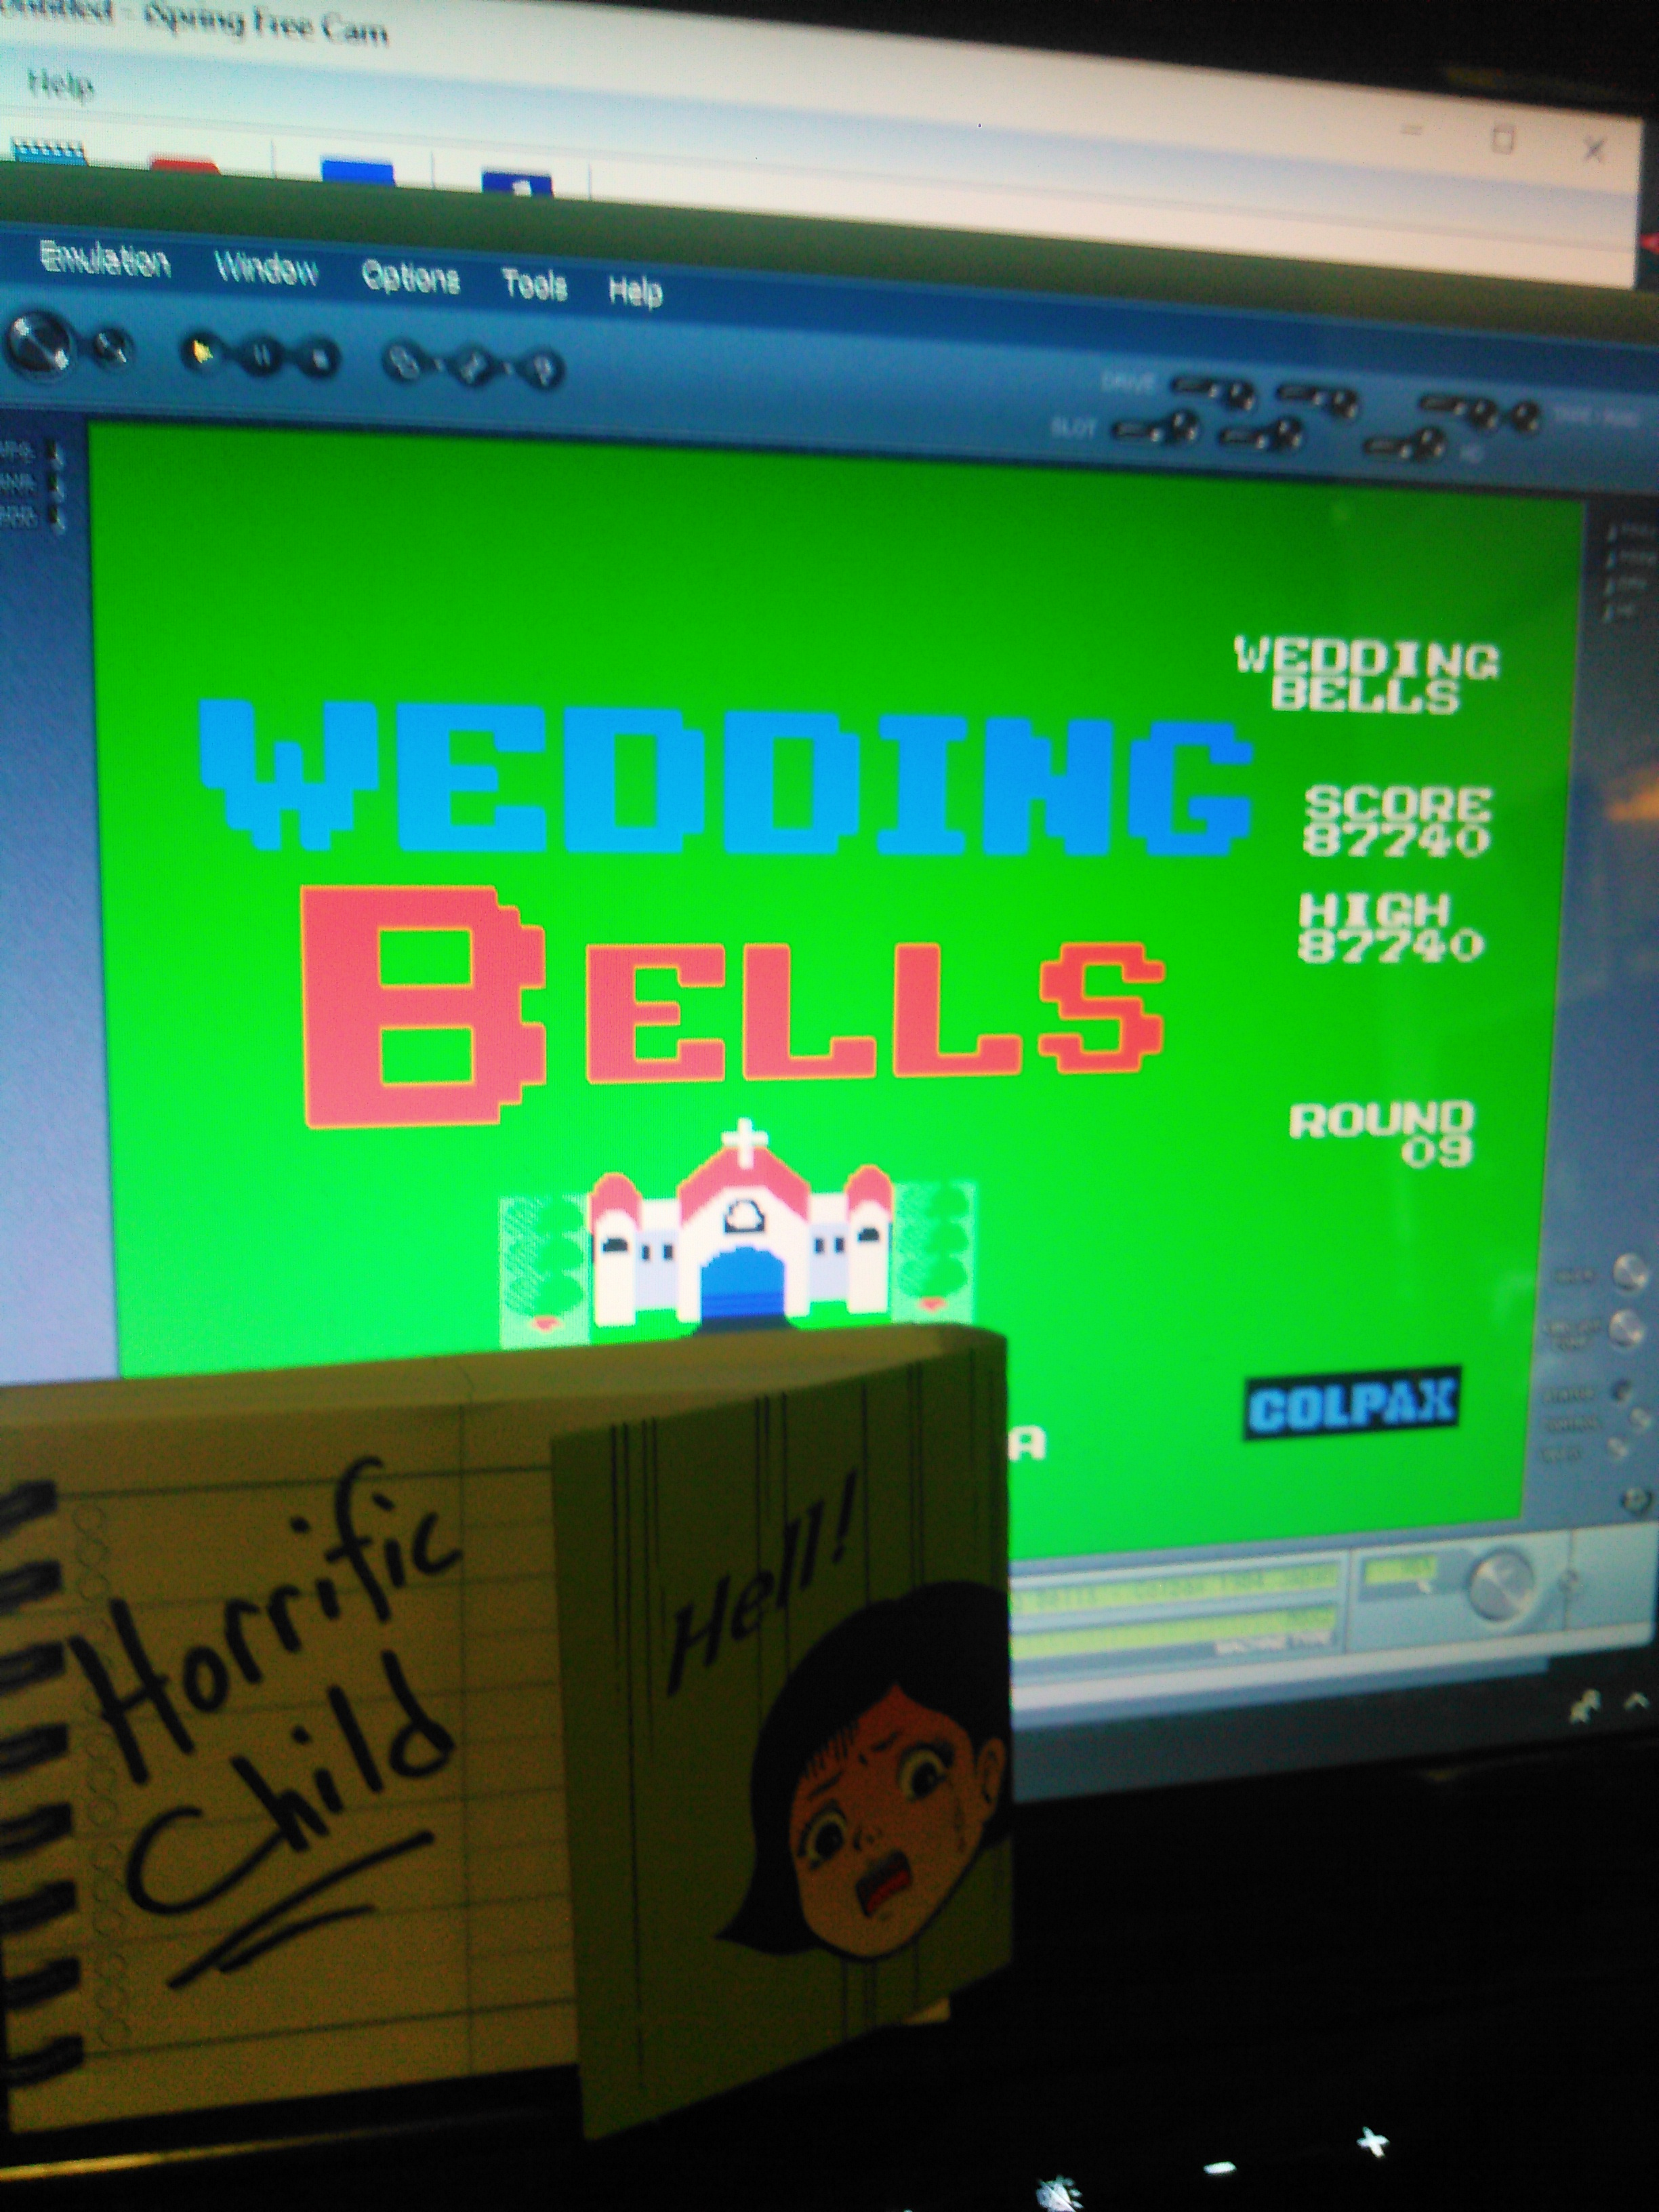 Wedding Bells 87,740 points